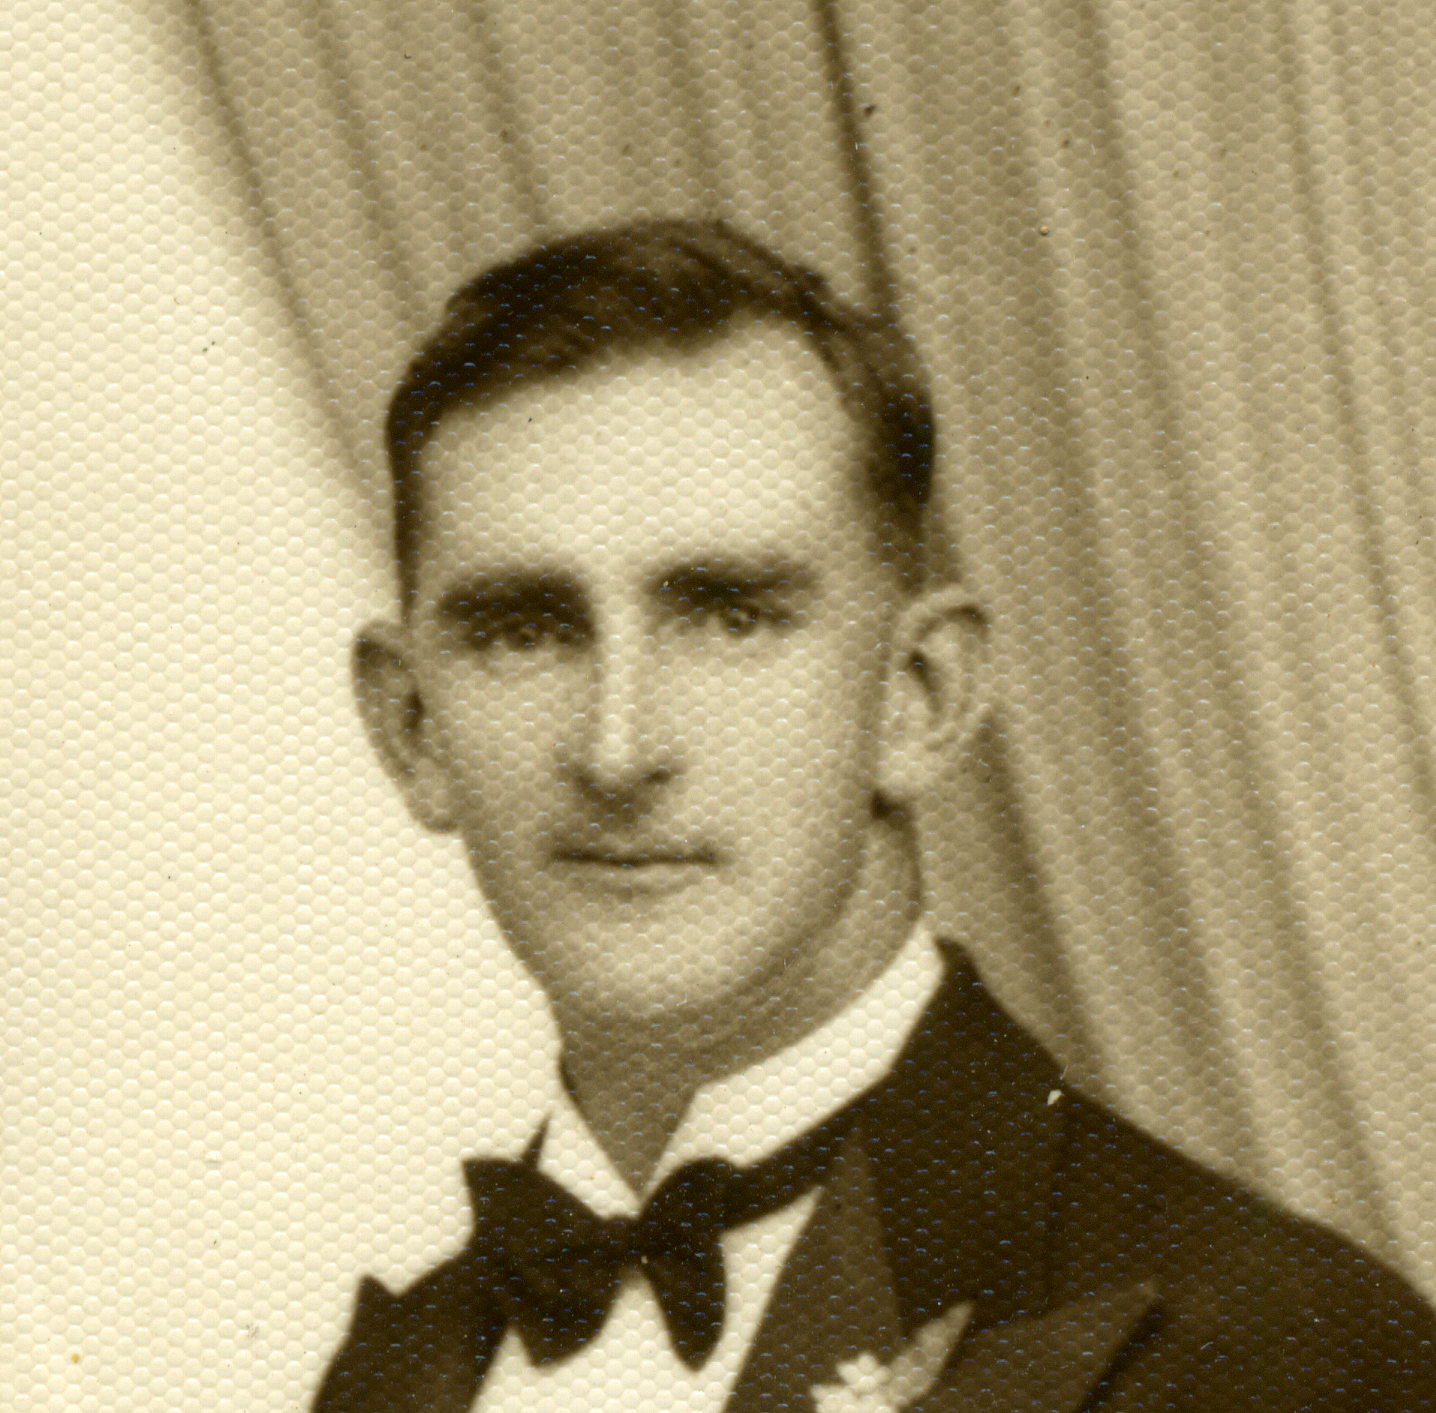 William Blackford